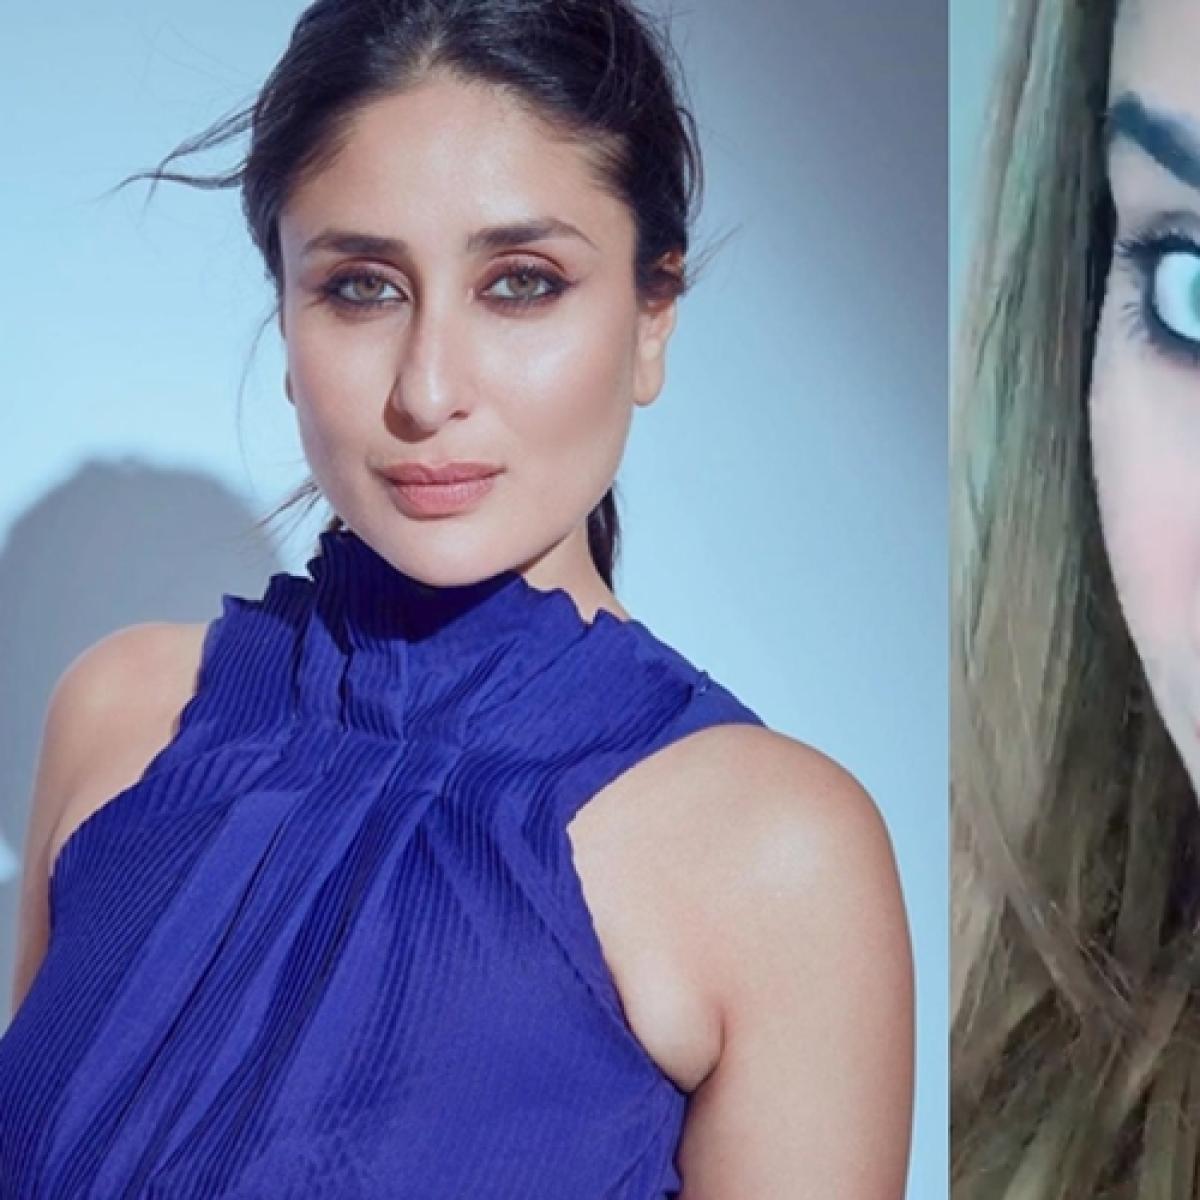 Bebo Main Bebo: Kareena Kapoor's TikTok doppelganger will leave Saif Ali Khan confused